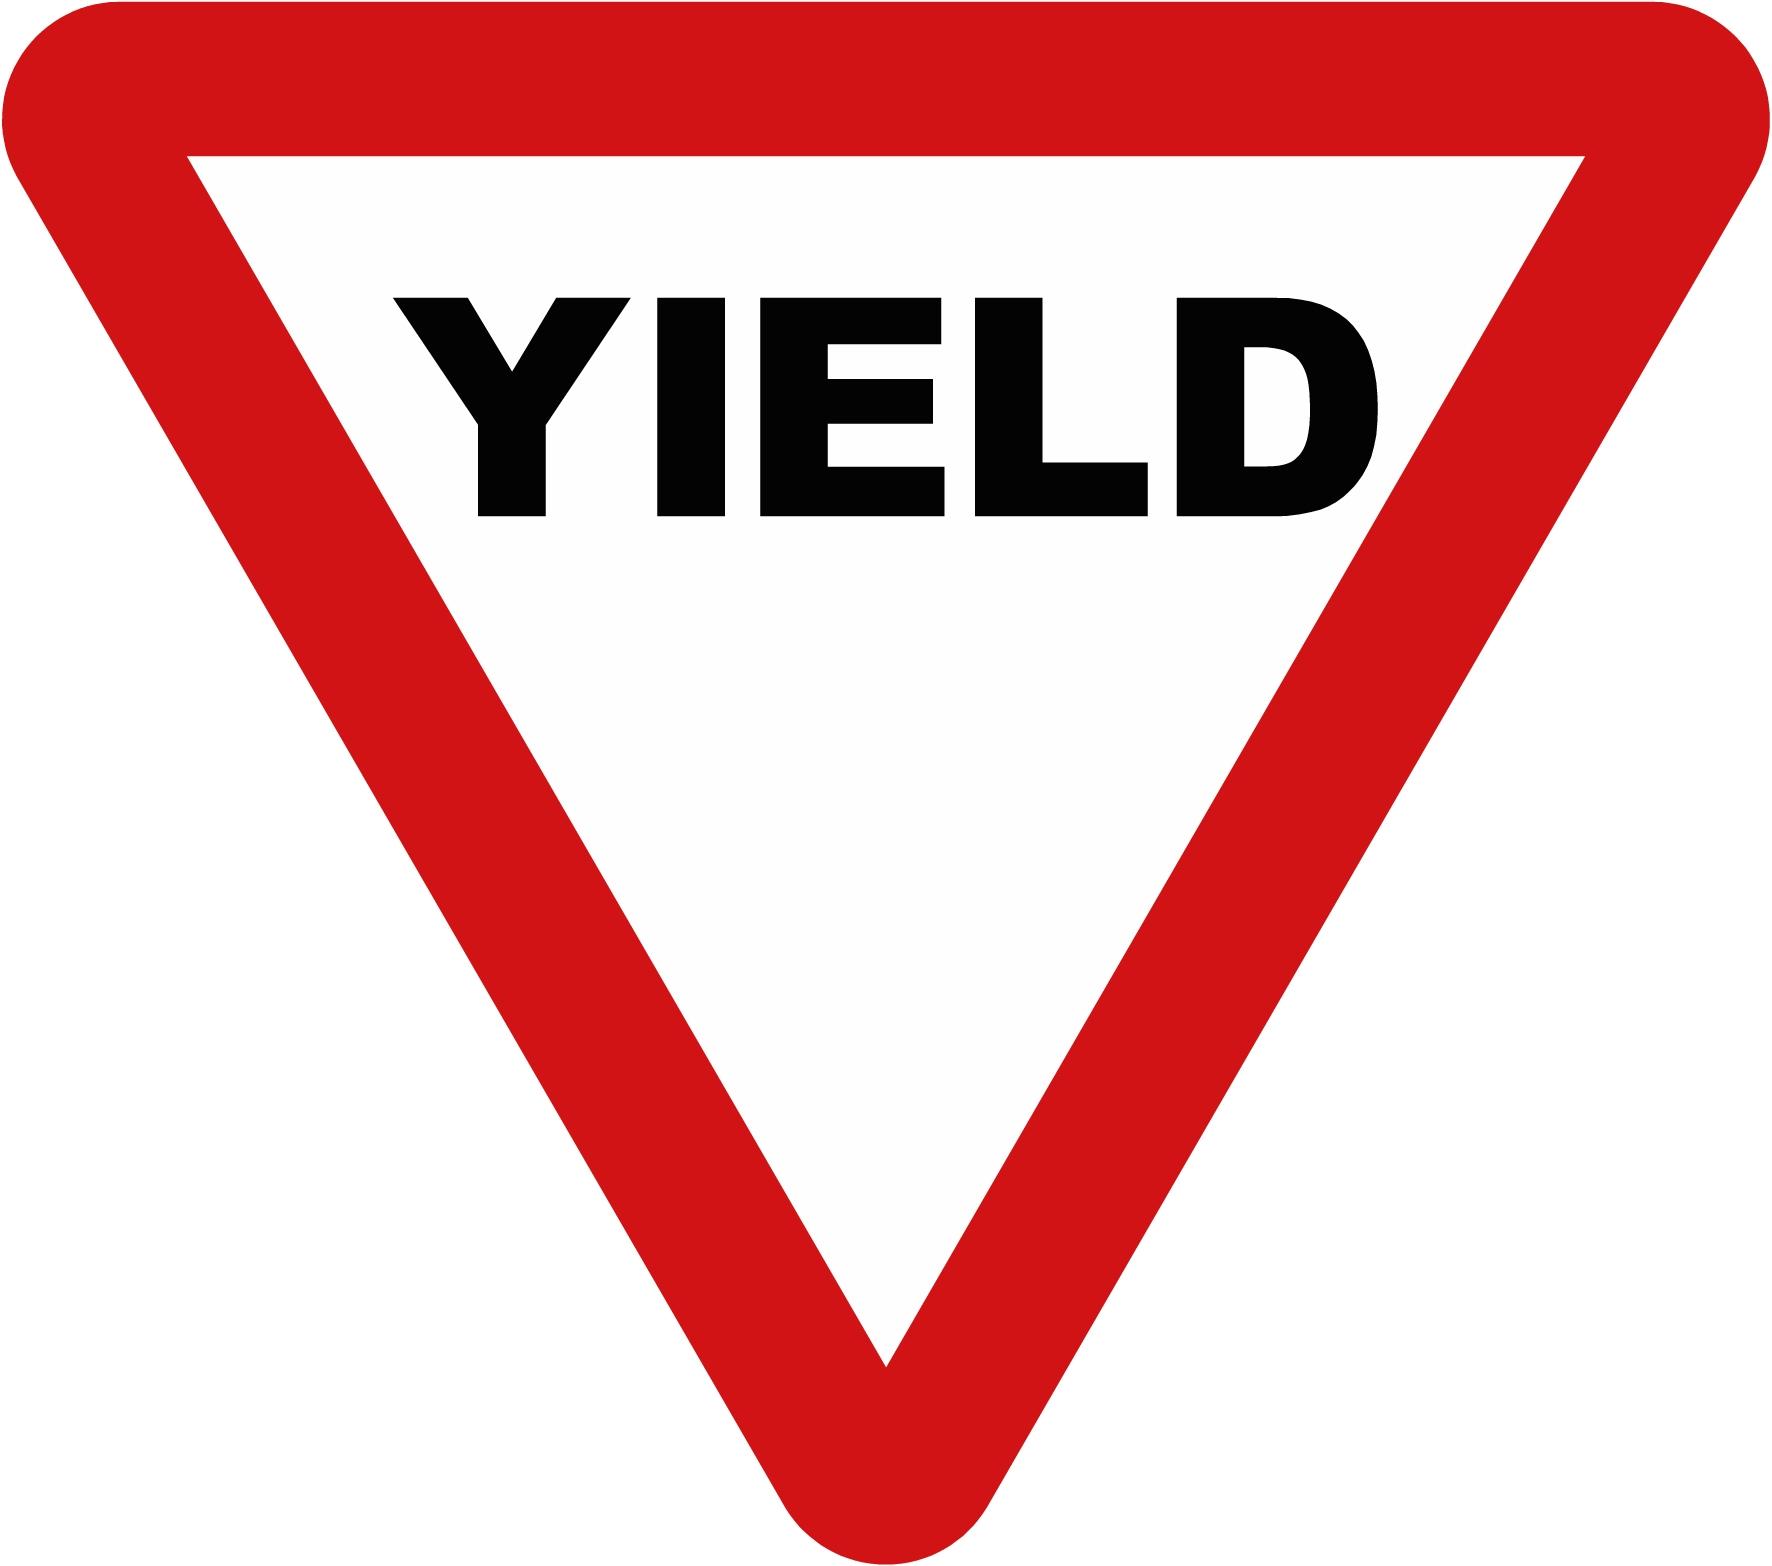 yellow yield sign clipart clipart panda free clipart images rh clipartpanda com yellow yield sign clip art yield traffic sign clip art